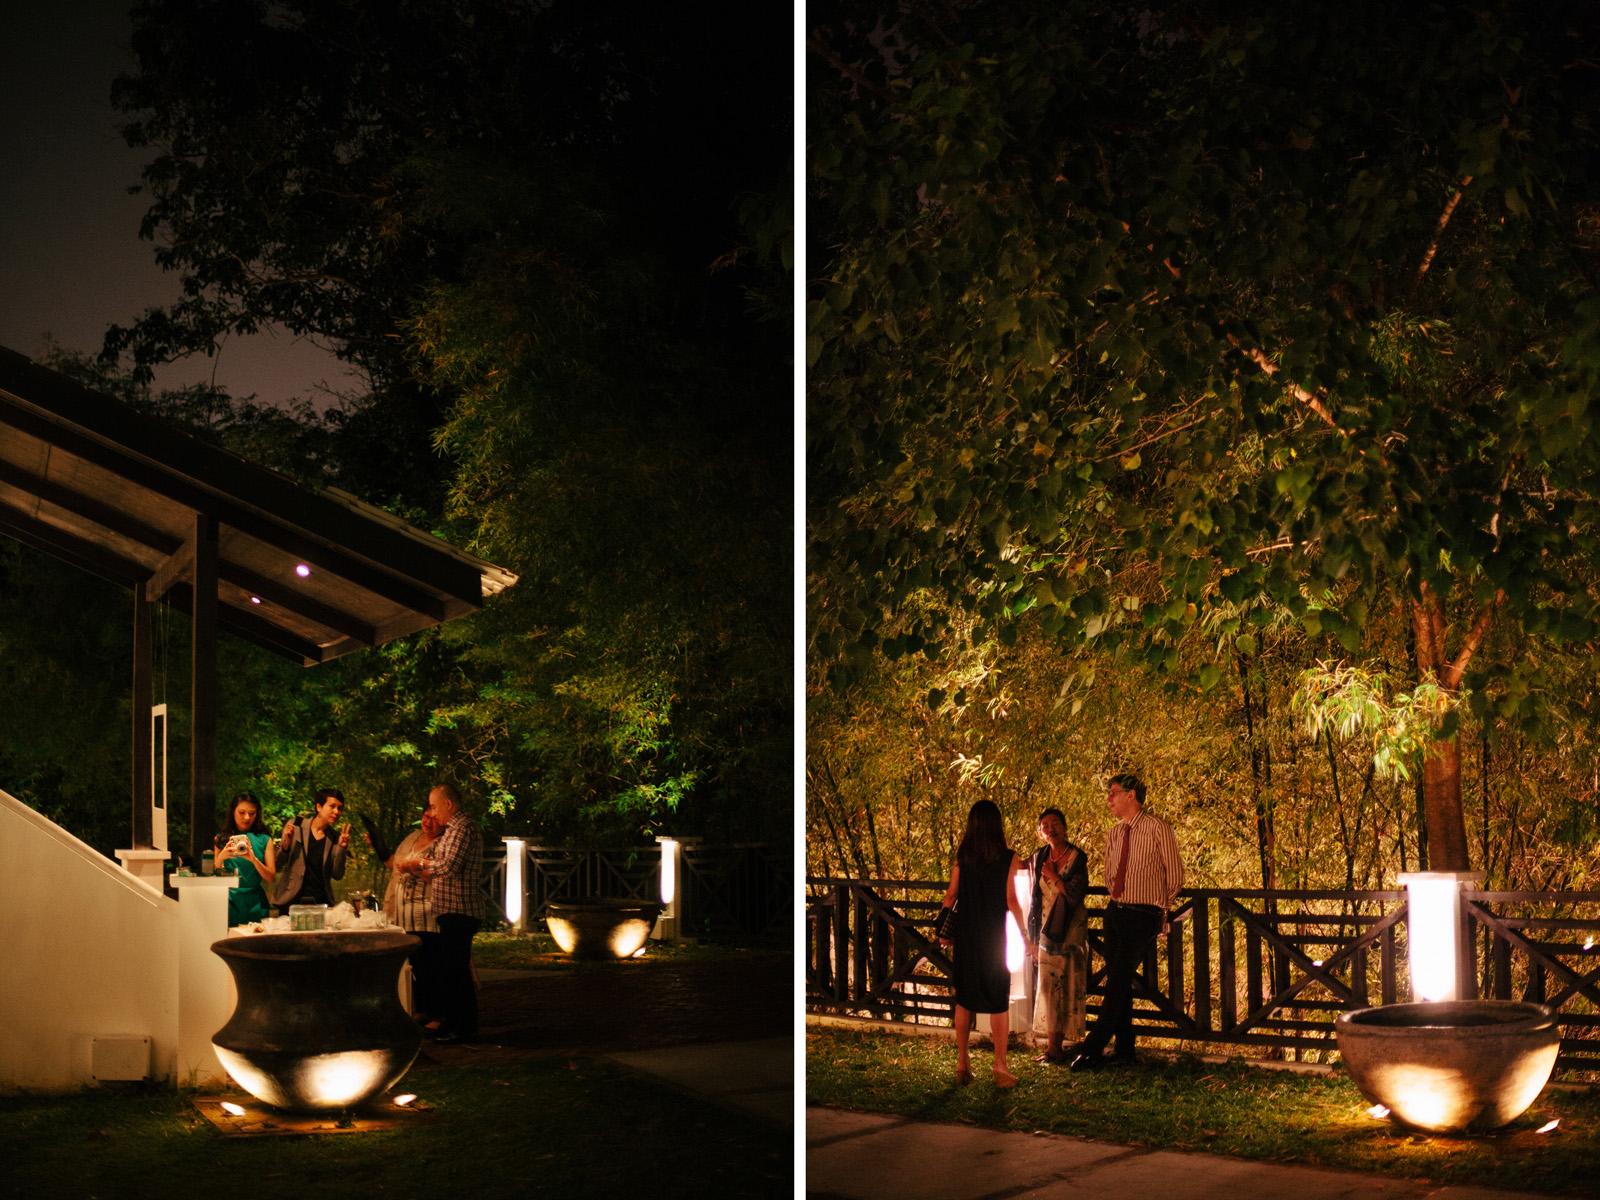 singapore-wedding-travel-photographer-faith-alvin-wedding-wmt-55.jpg